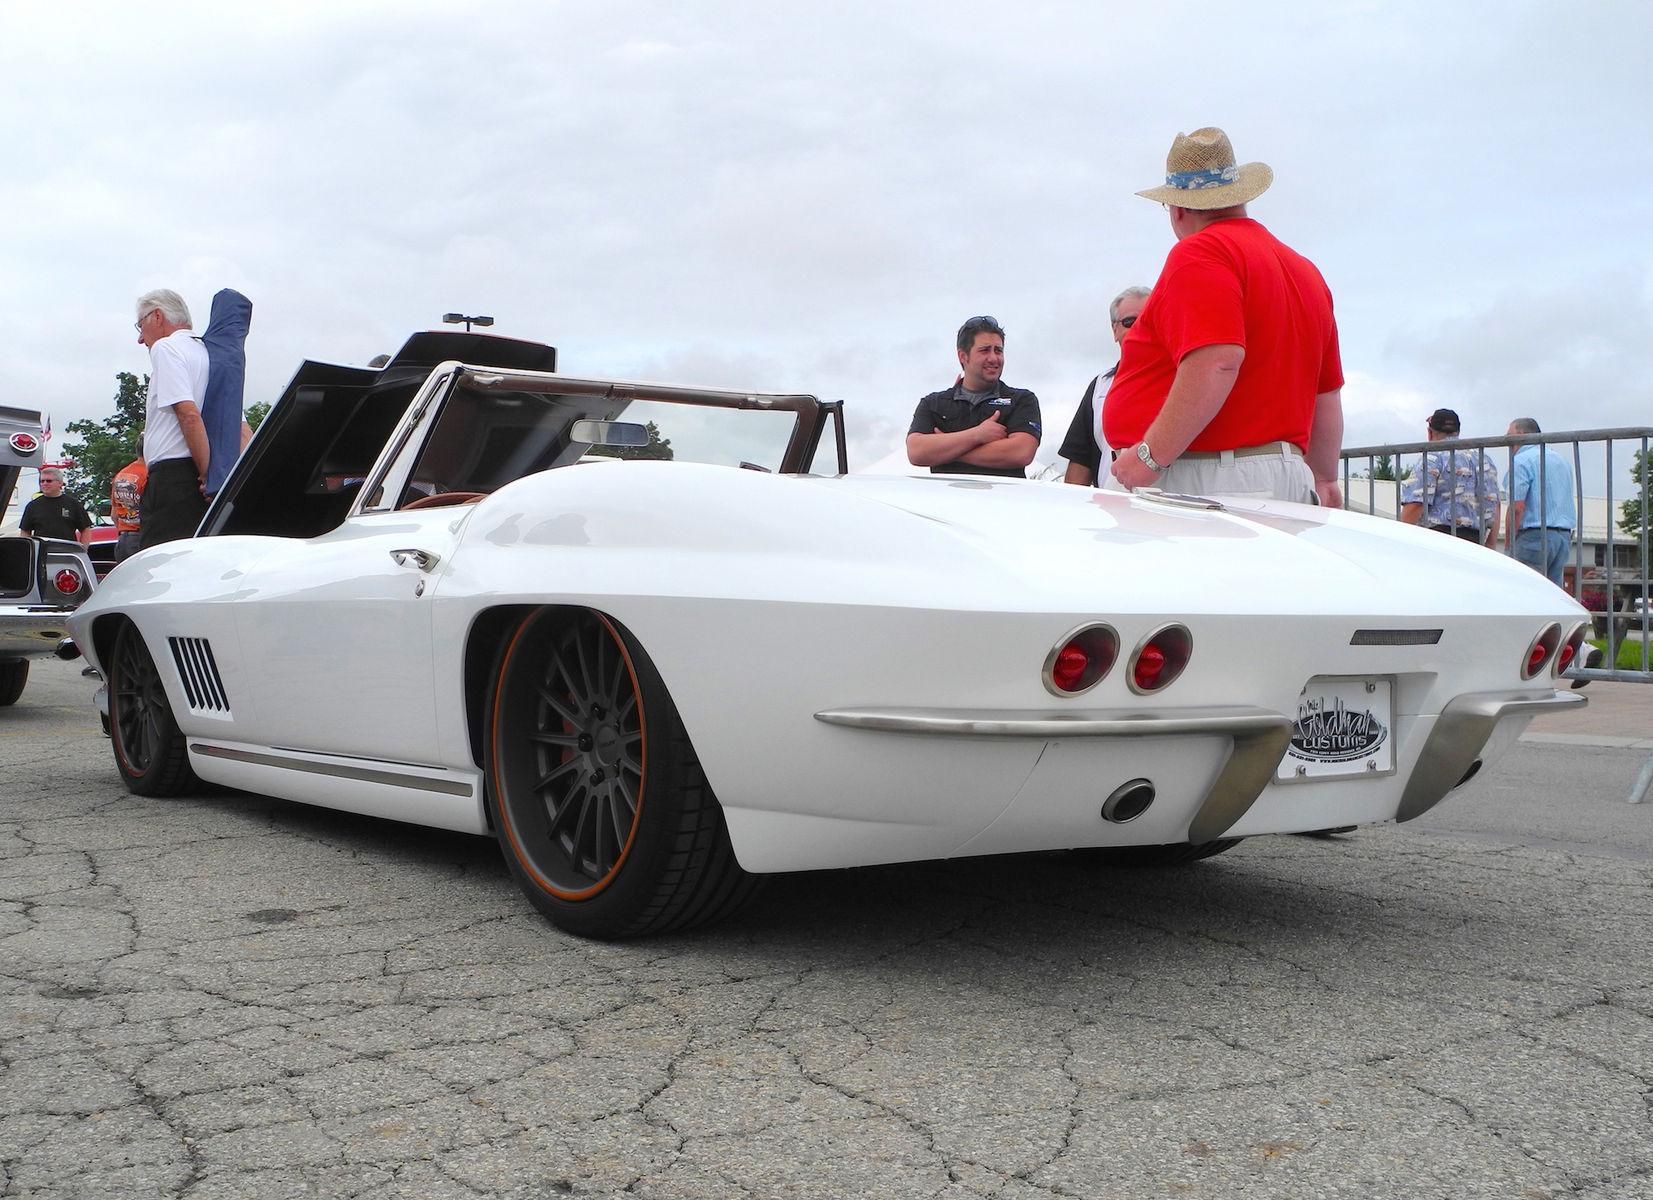 1967 Chevrolet Corvette   2015 Street Machine of the Year